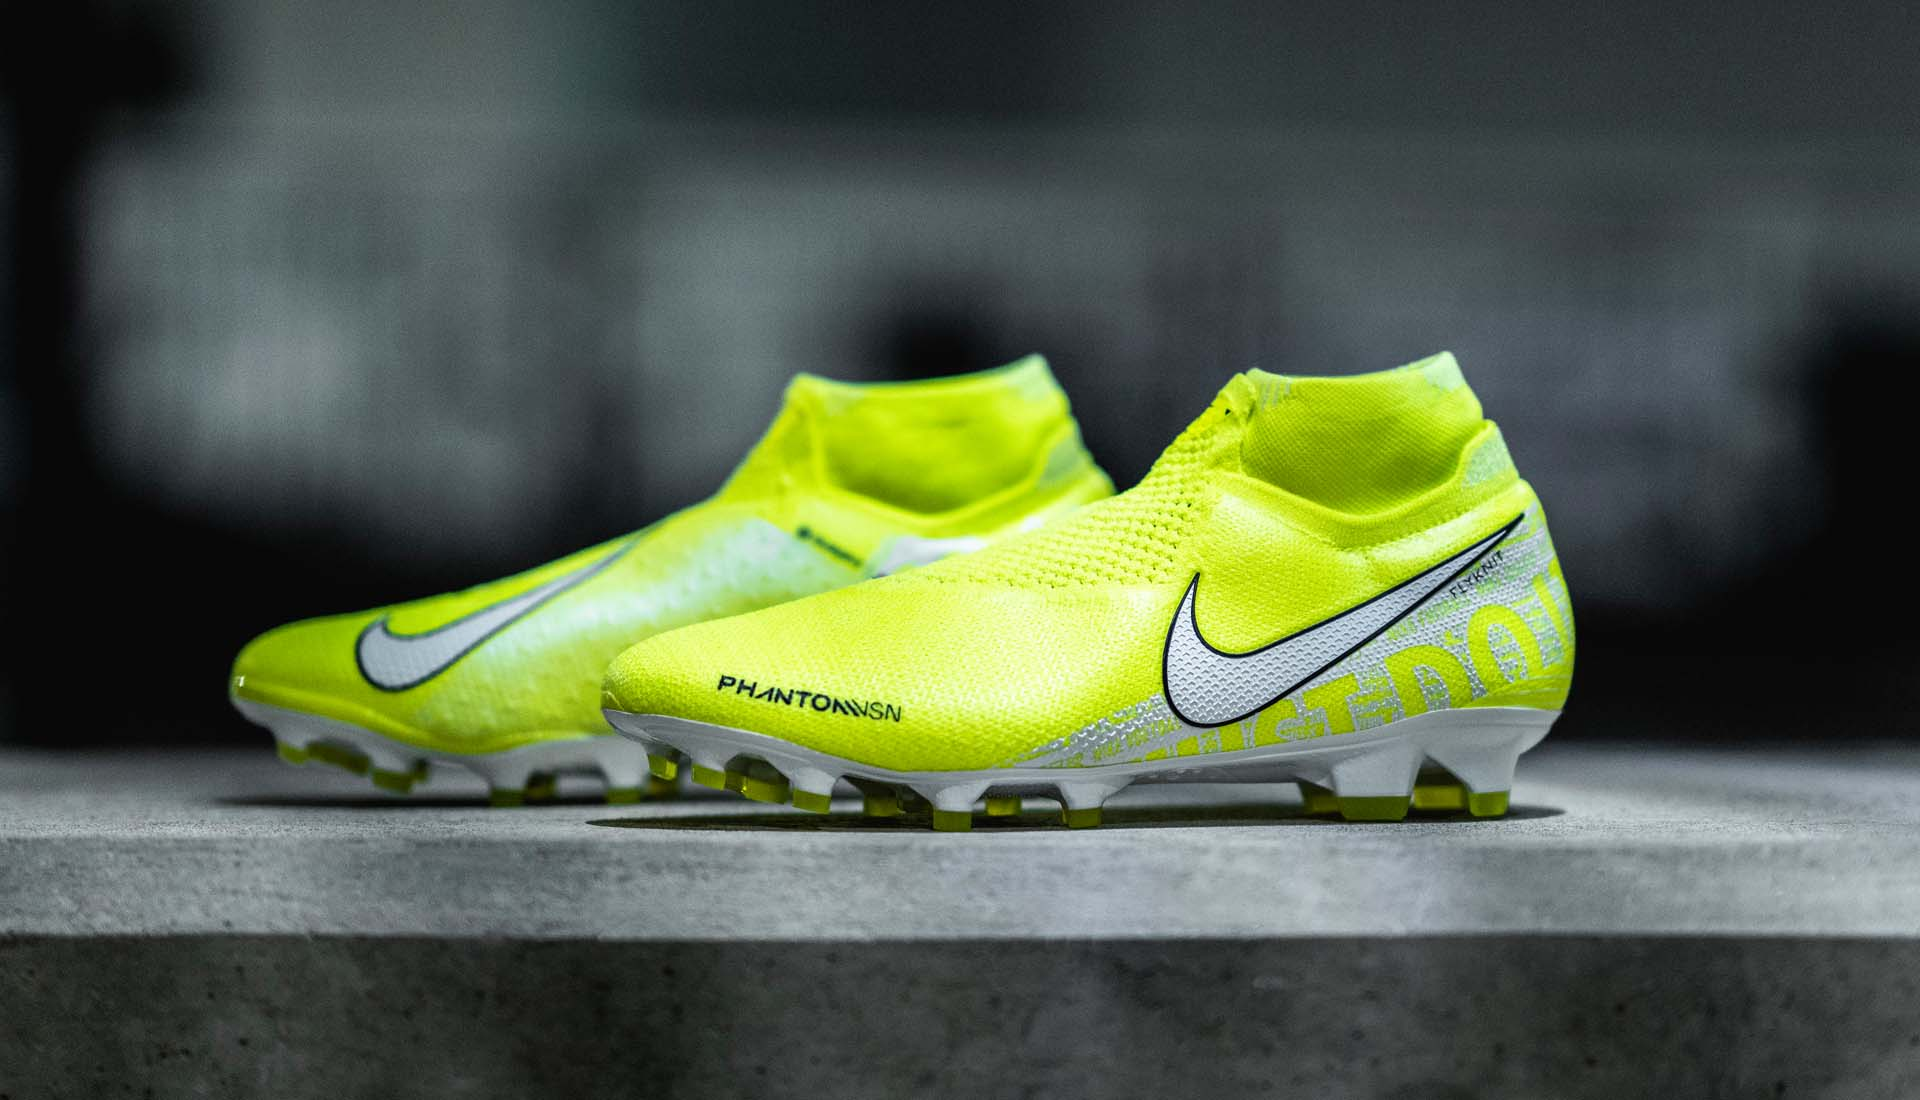 Nike Launch The PhantomVSN \